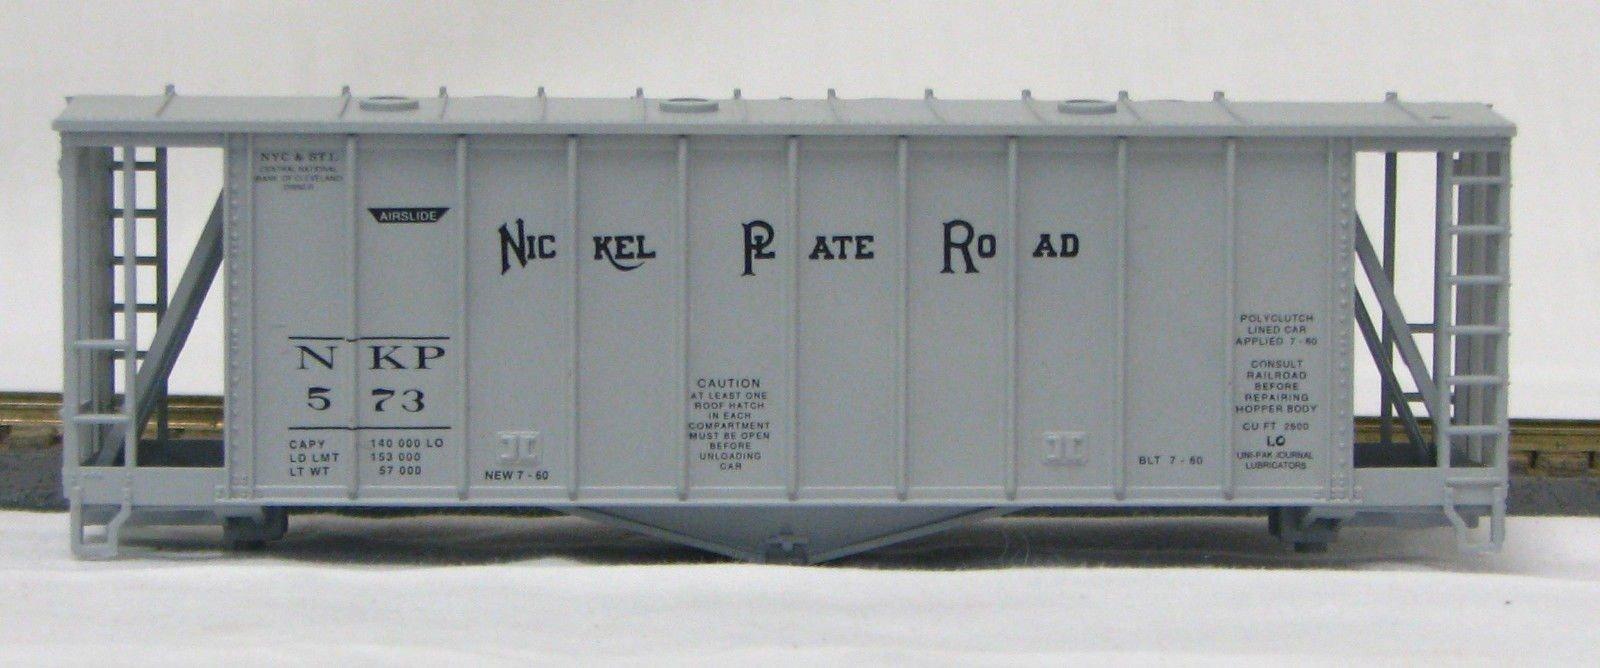 HO 2600 Cu Ft Airslide Covered Hopper (Kit) Nickle Plate Rd (01-9714)